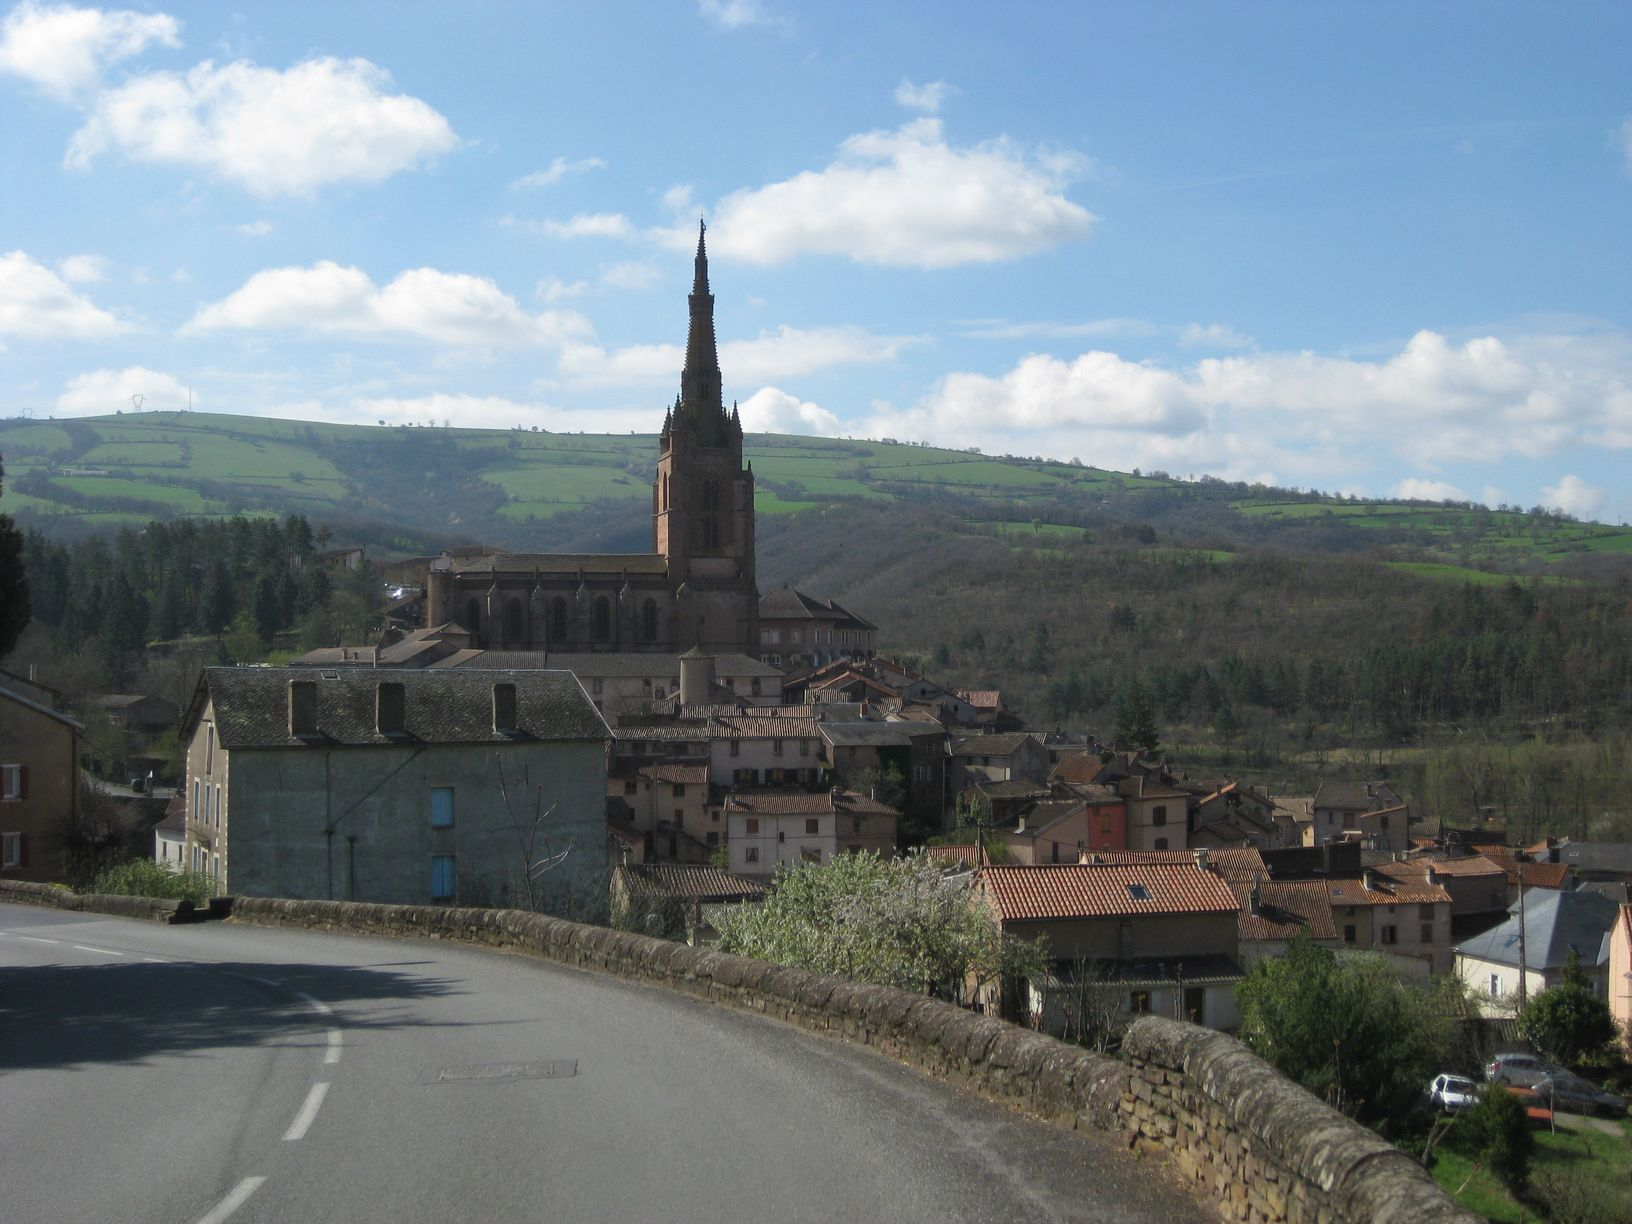 http://www.corambe.com/caminarello/IMG_6245.JPG